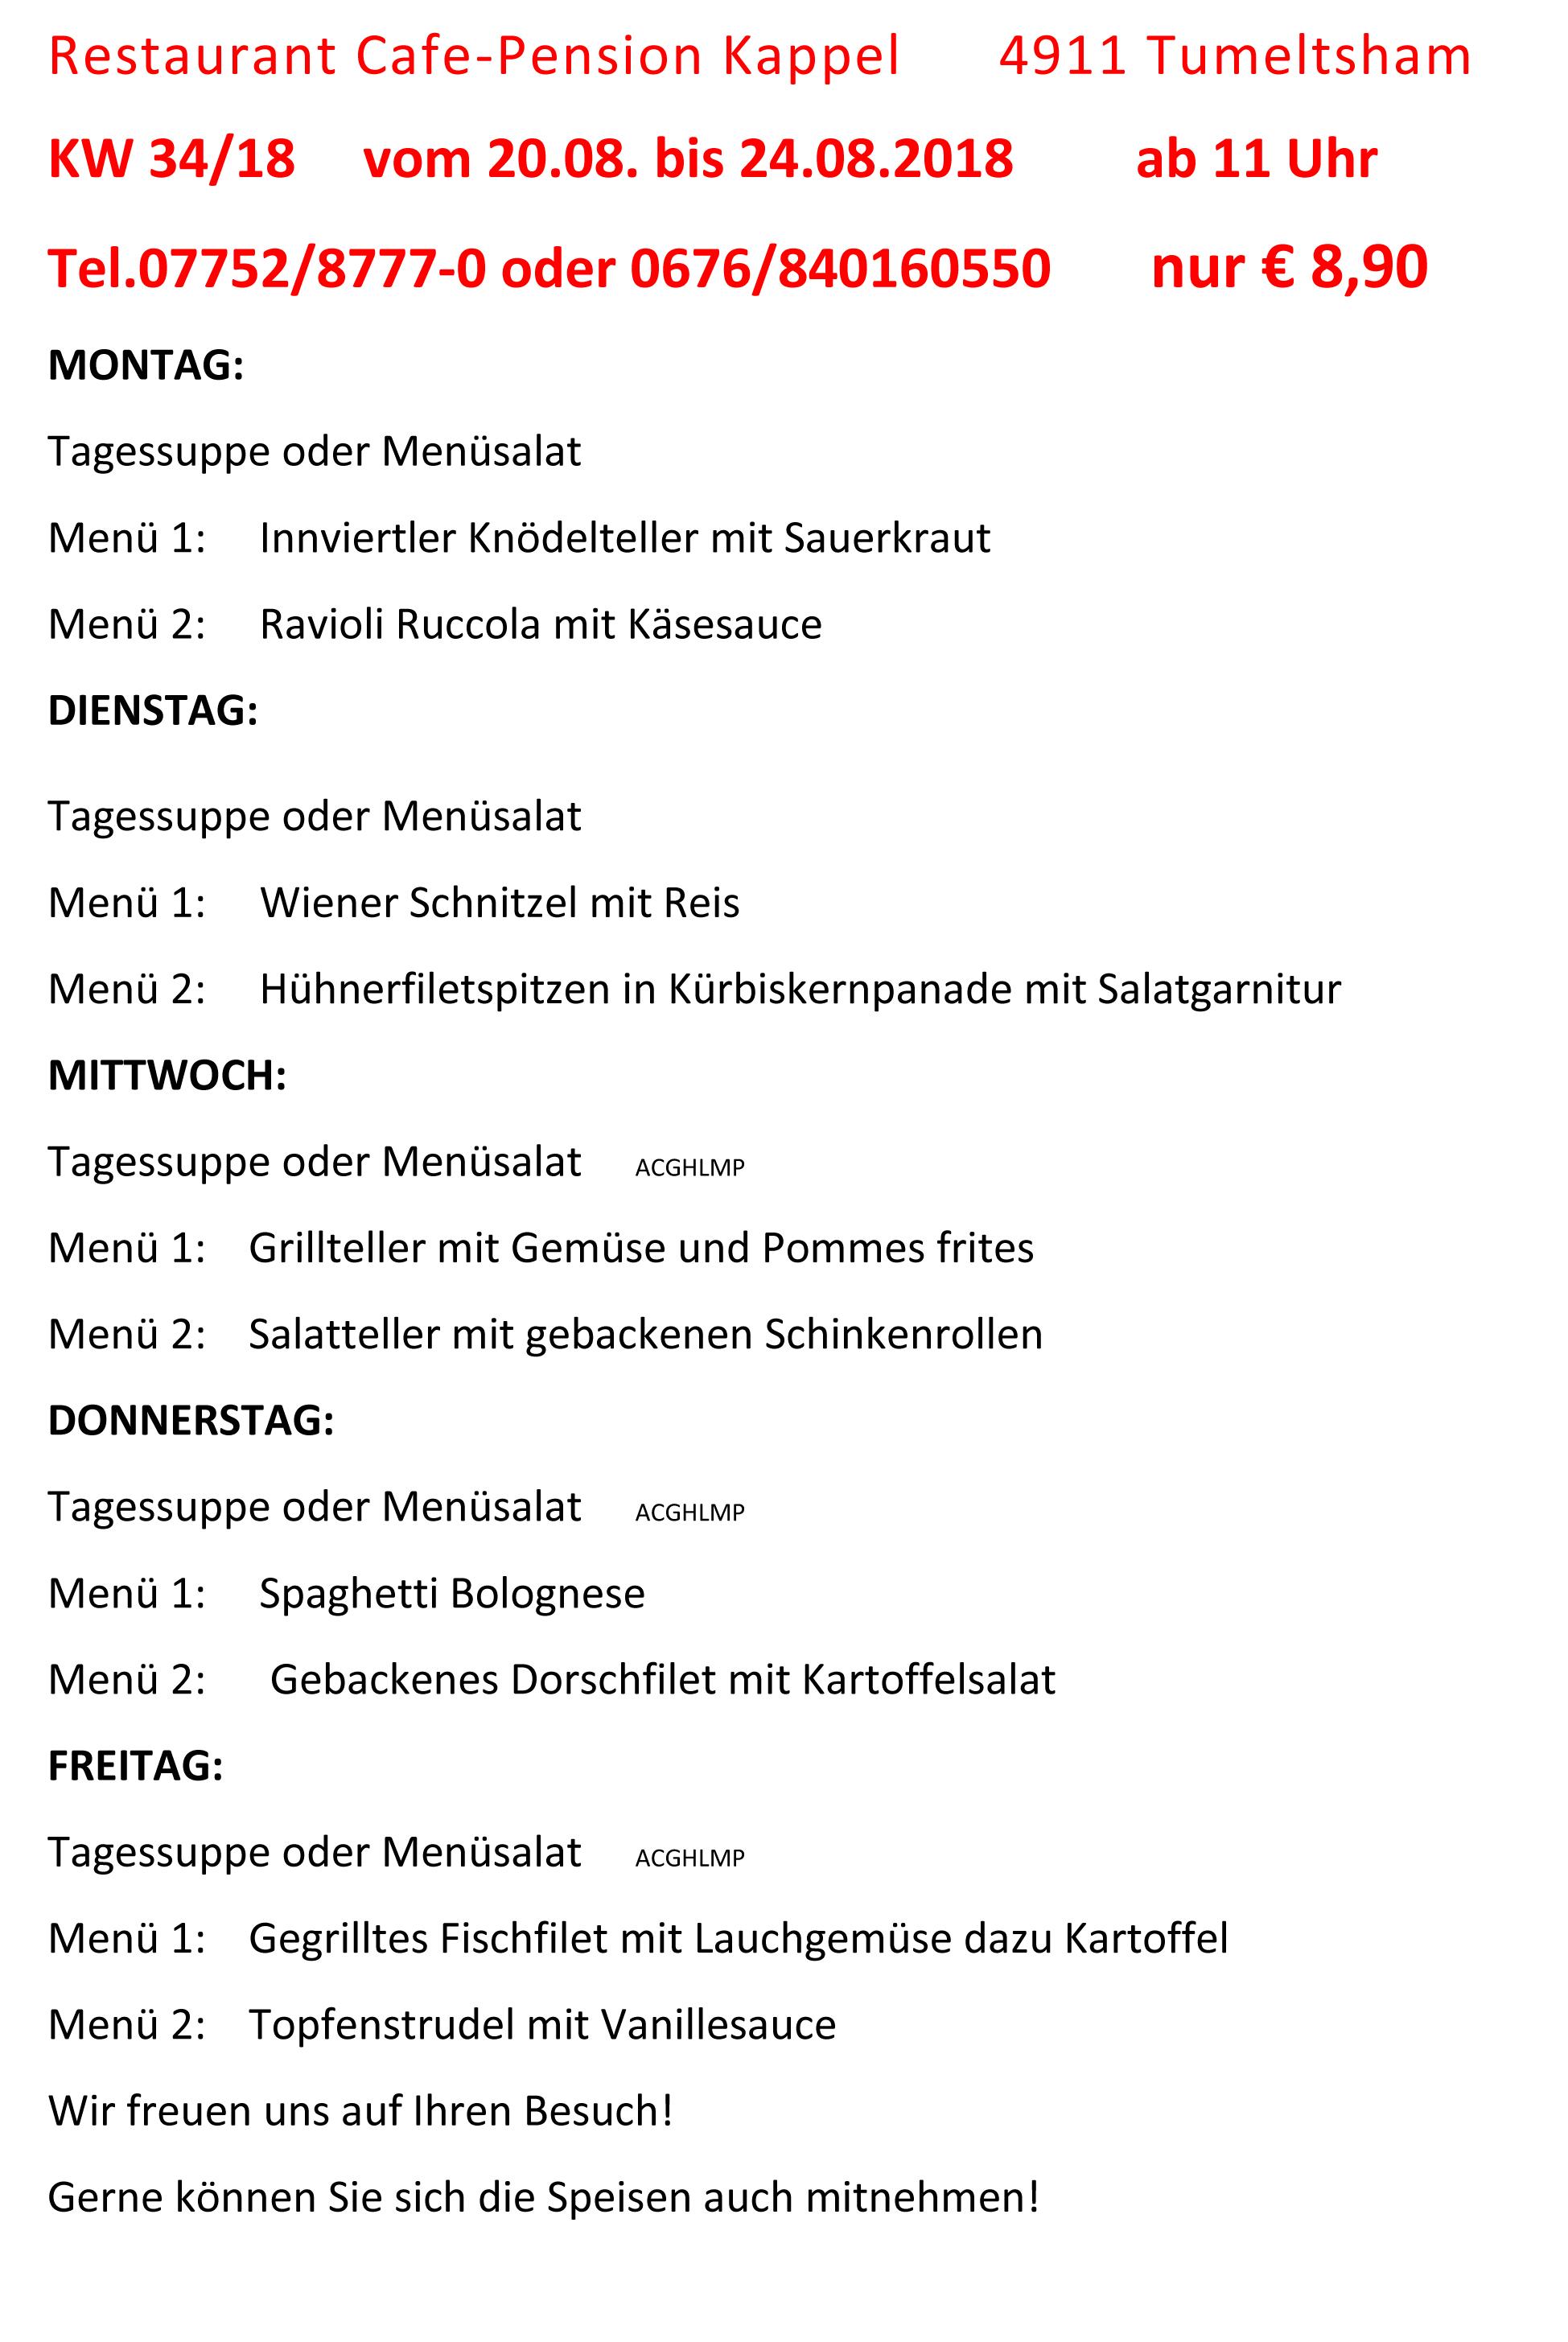 Menüplan KW 34-18 (1)